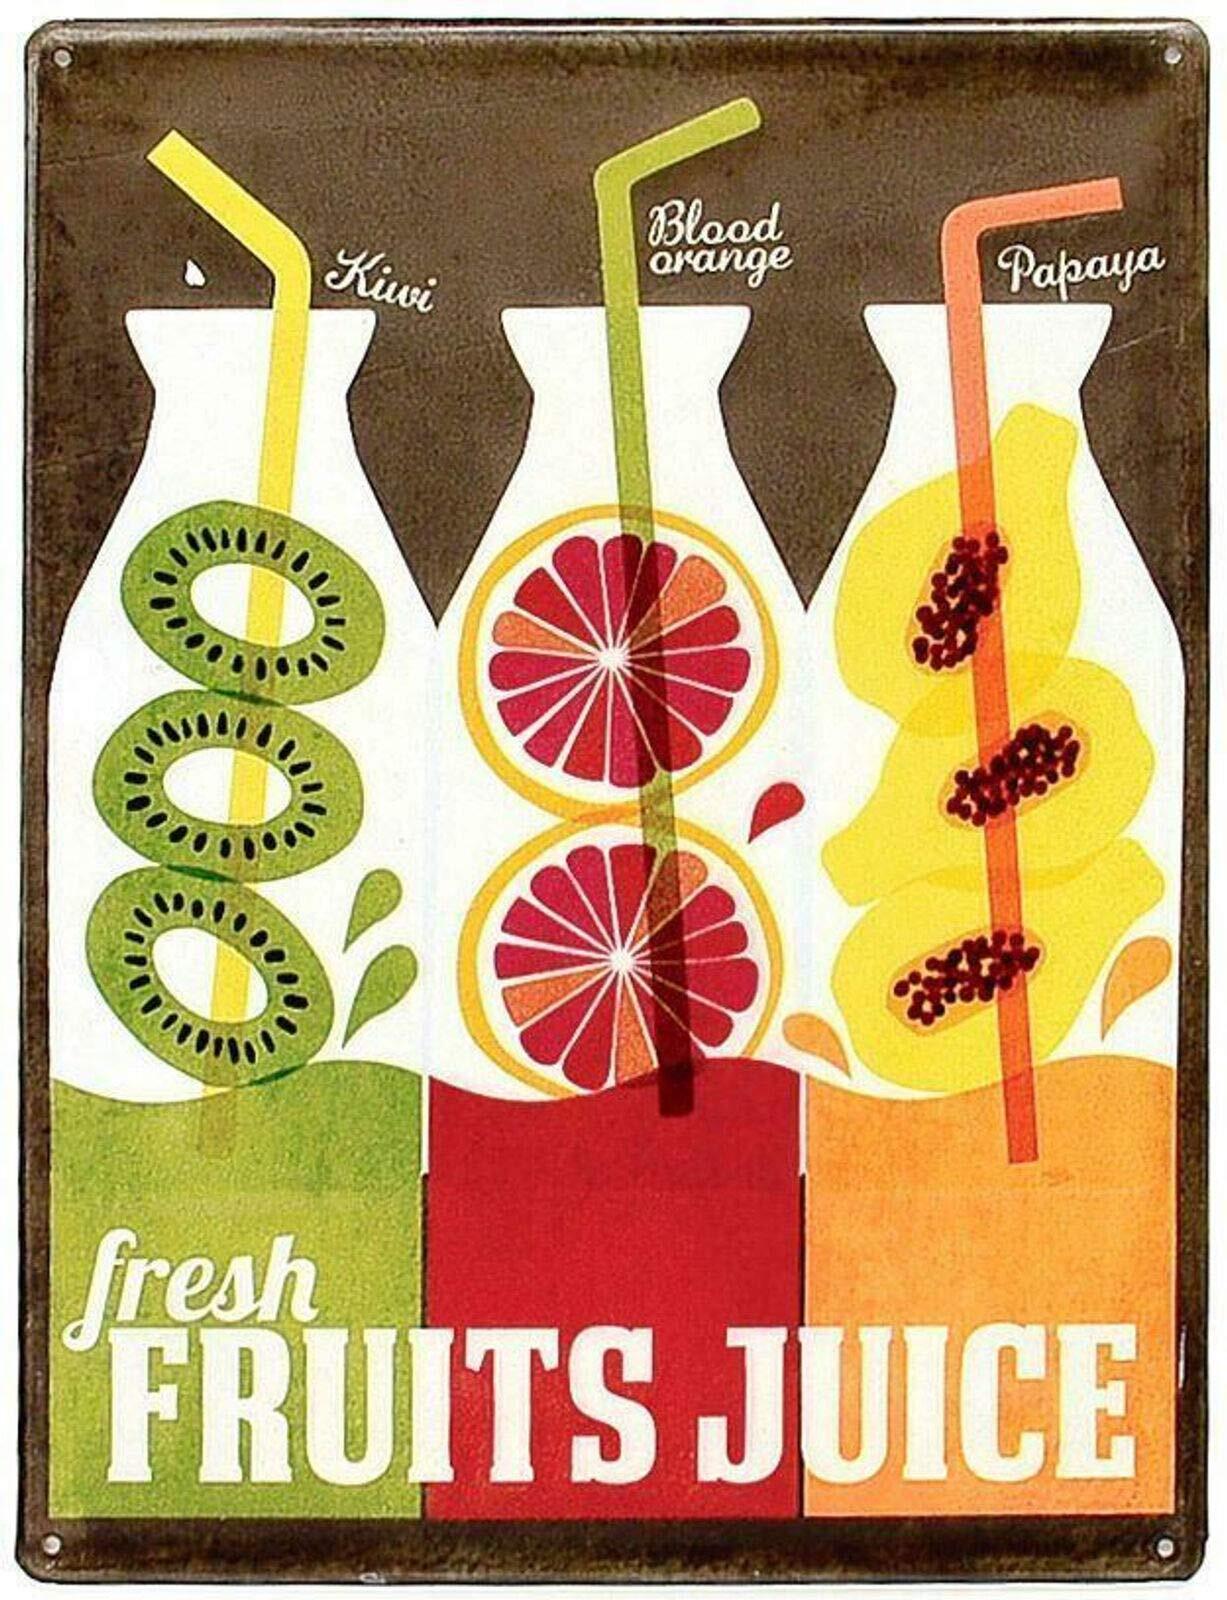 Kiwi Orange Papaya Fresh Fruits Juice Cafe Tin Sign Board Home Decoration Nostalgic Vintage Retro Poster Dimensions 20x30 cm